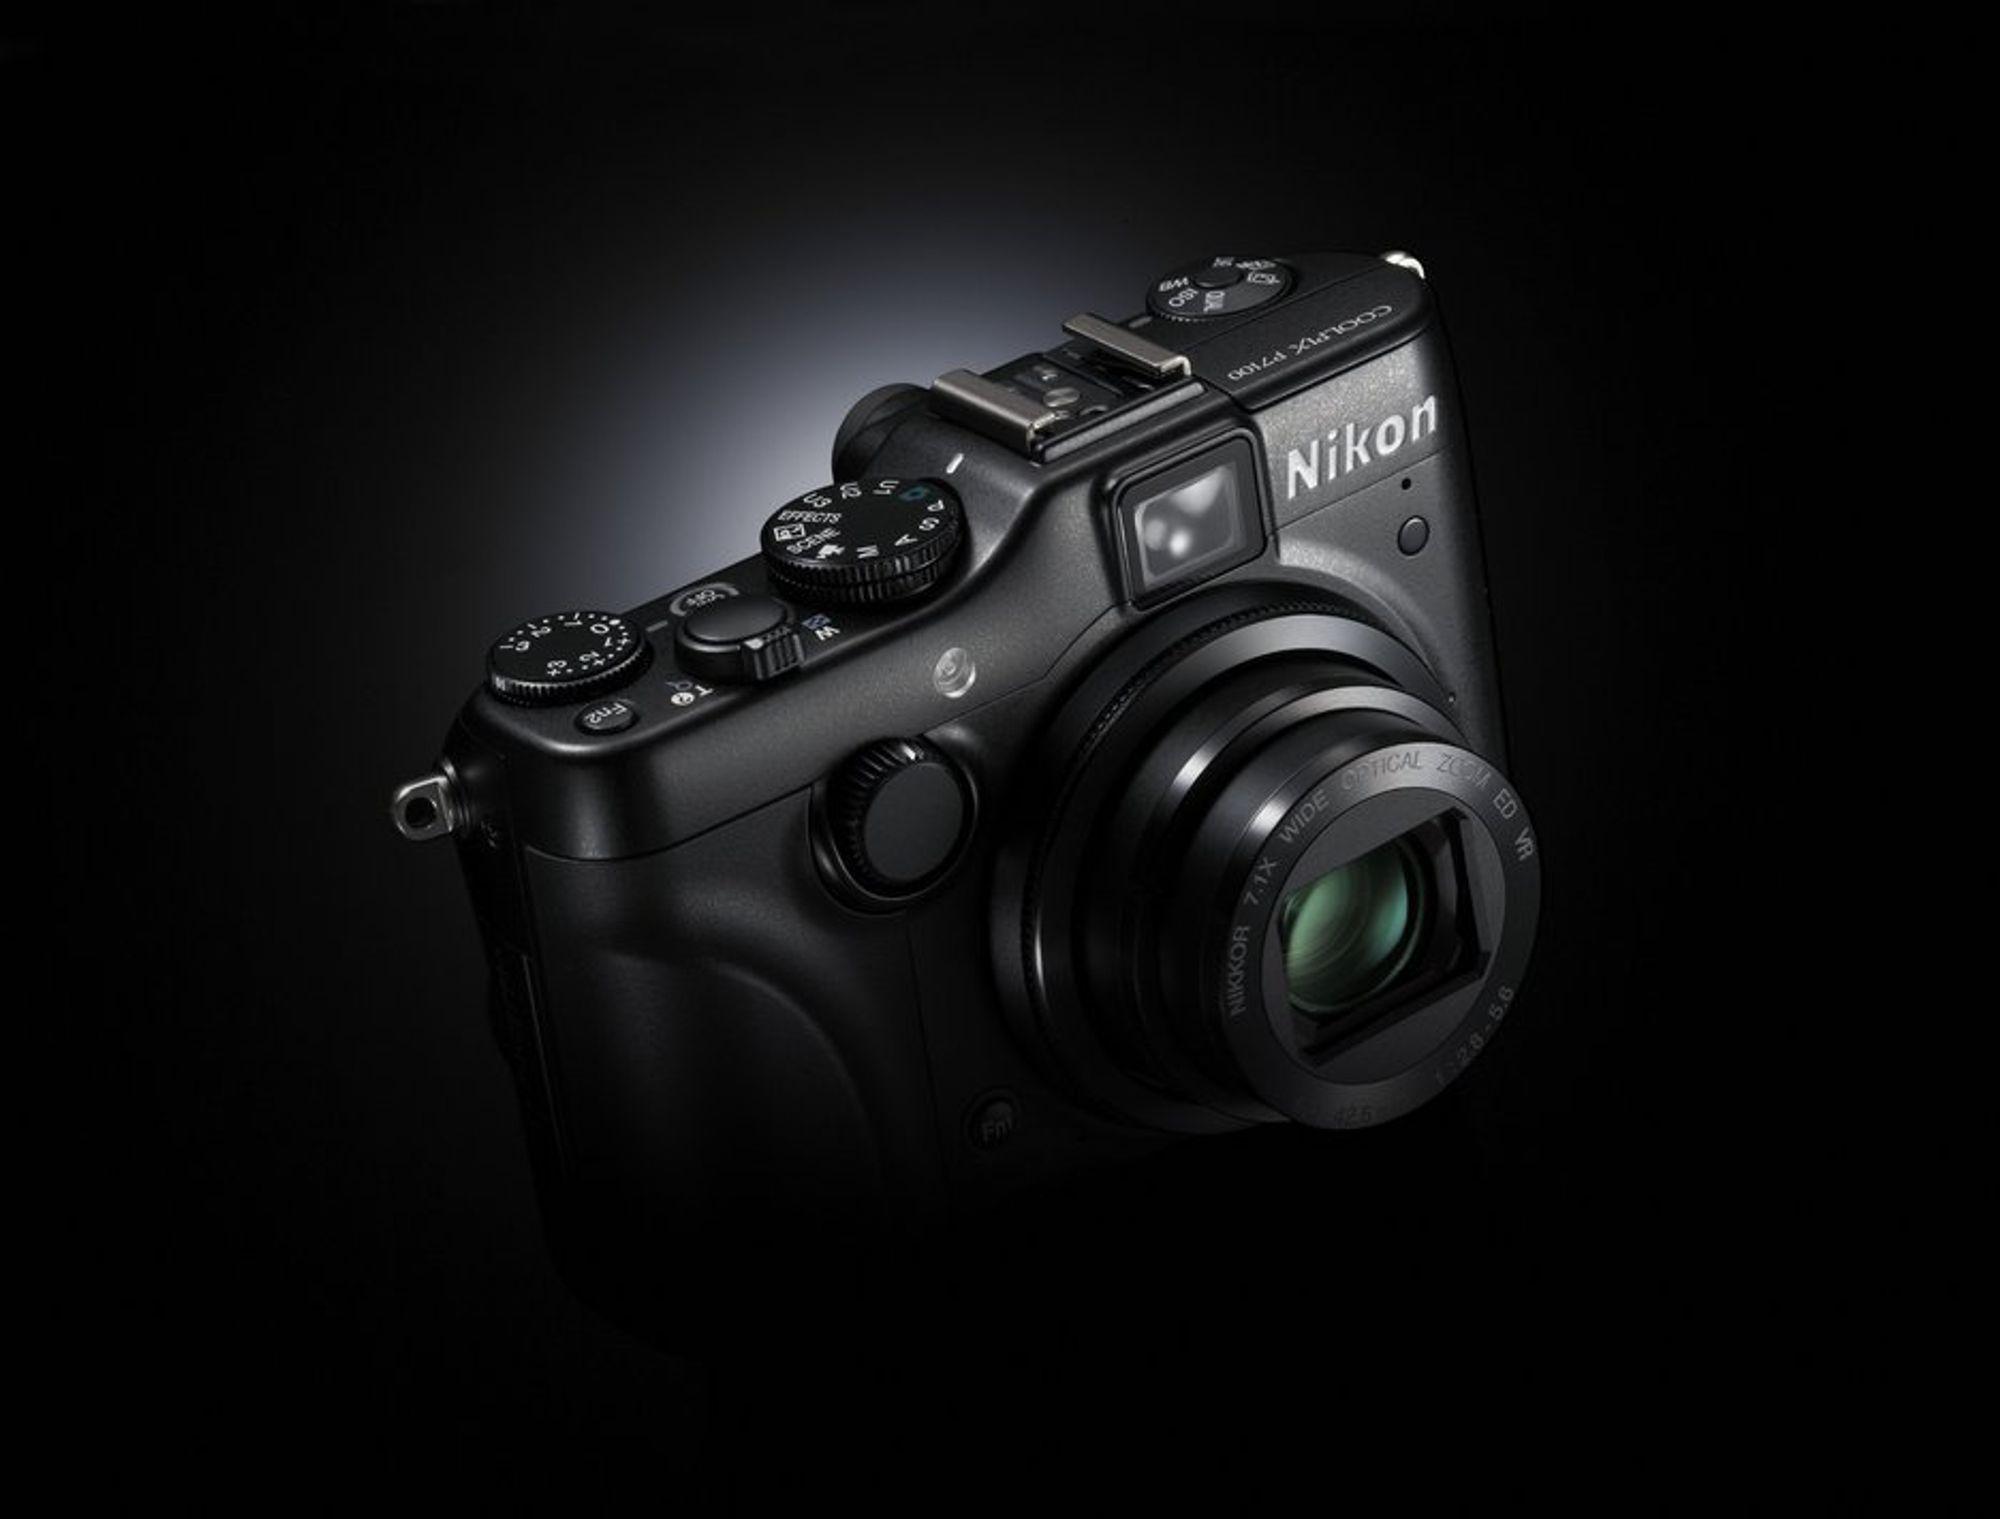 P7100 er Nikons nye flaggskip i Coolpix-serien.